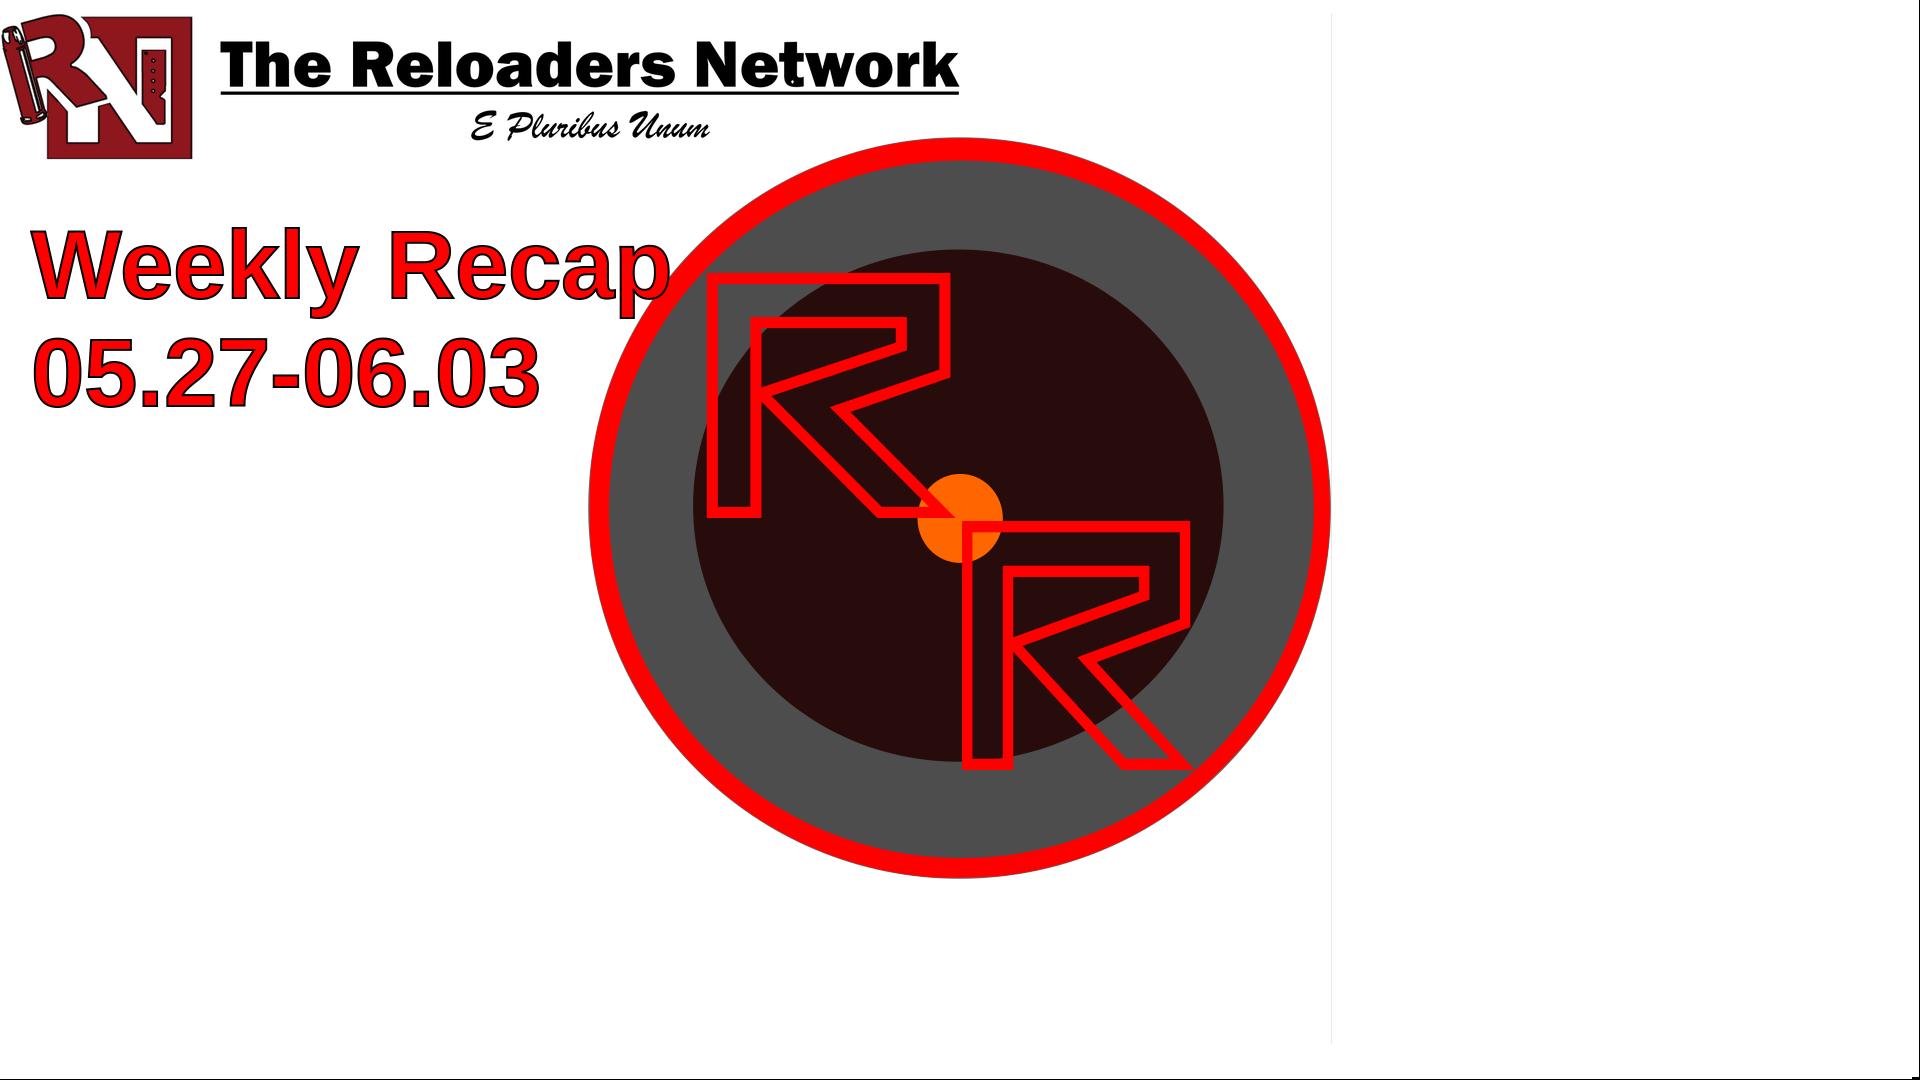 Weekly Recap Cover11